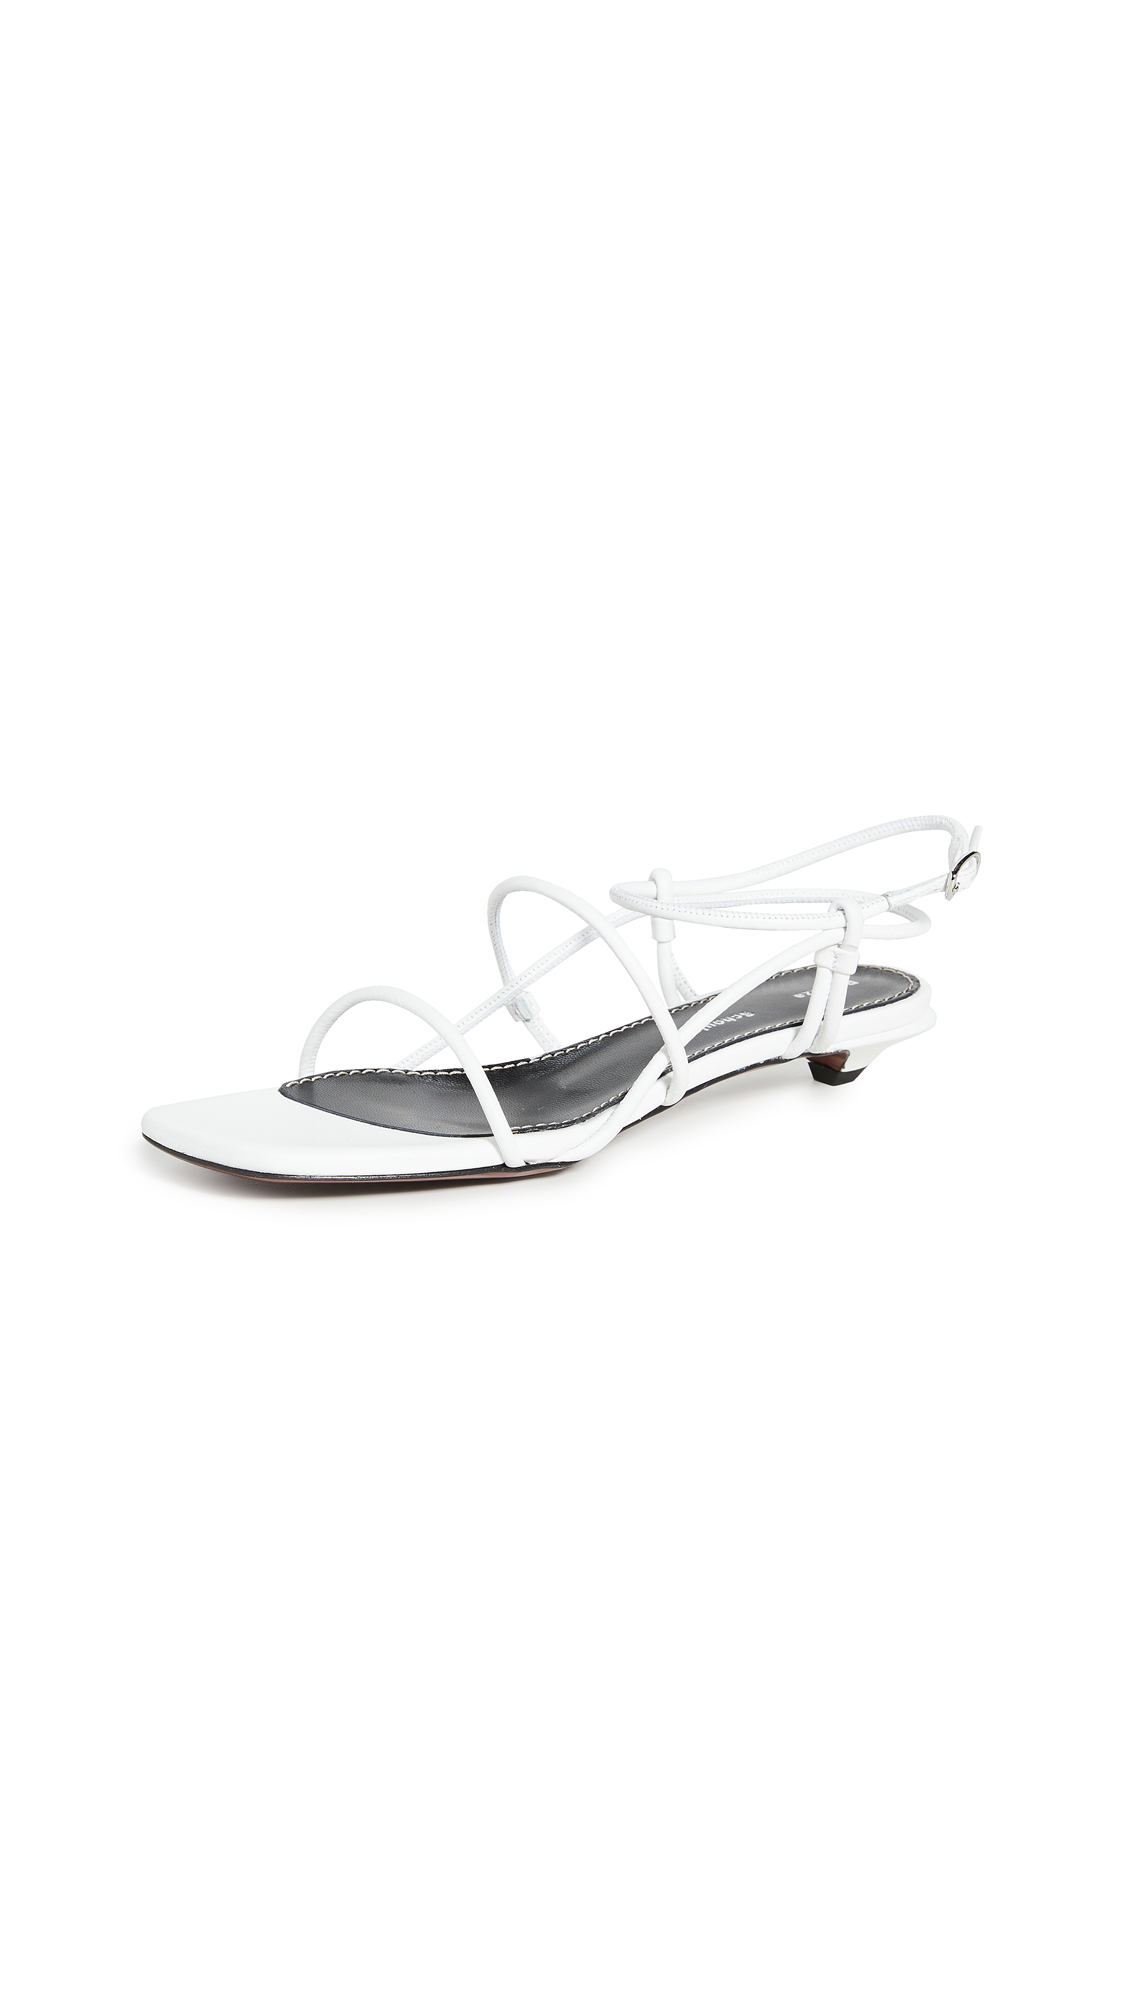 Proenza Schouler Strappy Low Sandals - 60% Off Sale